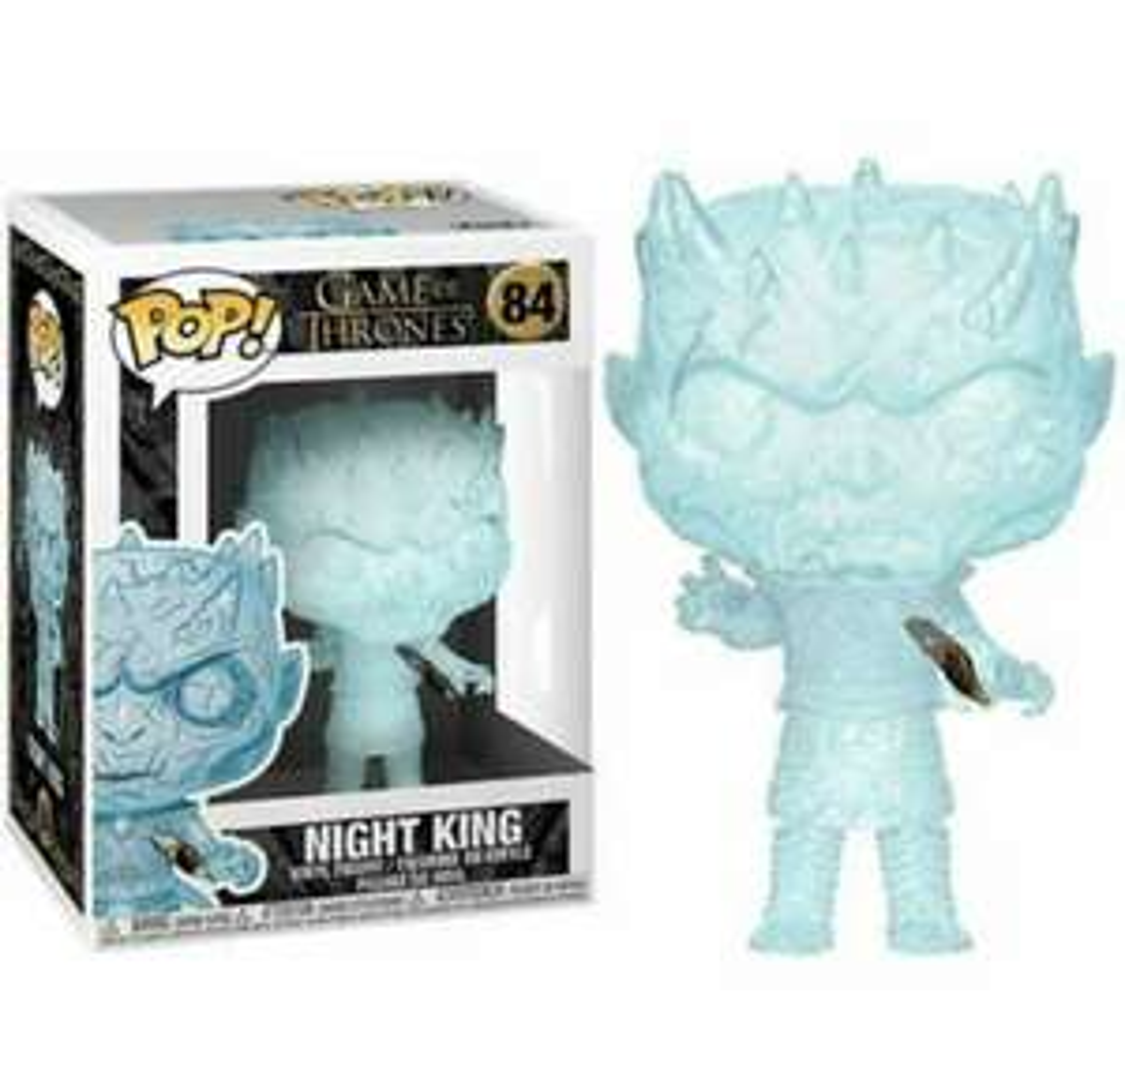 Figurine Funko Pop! Game of Thrones - Crystal Night King